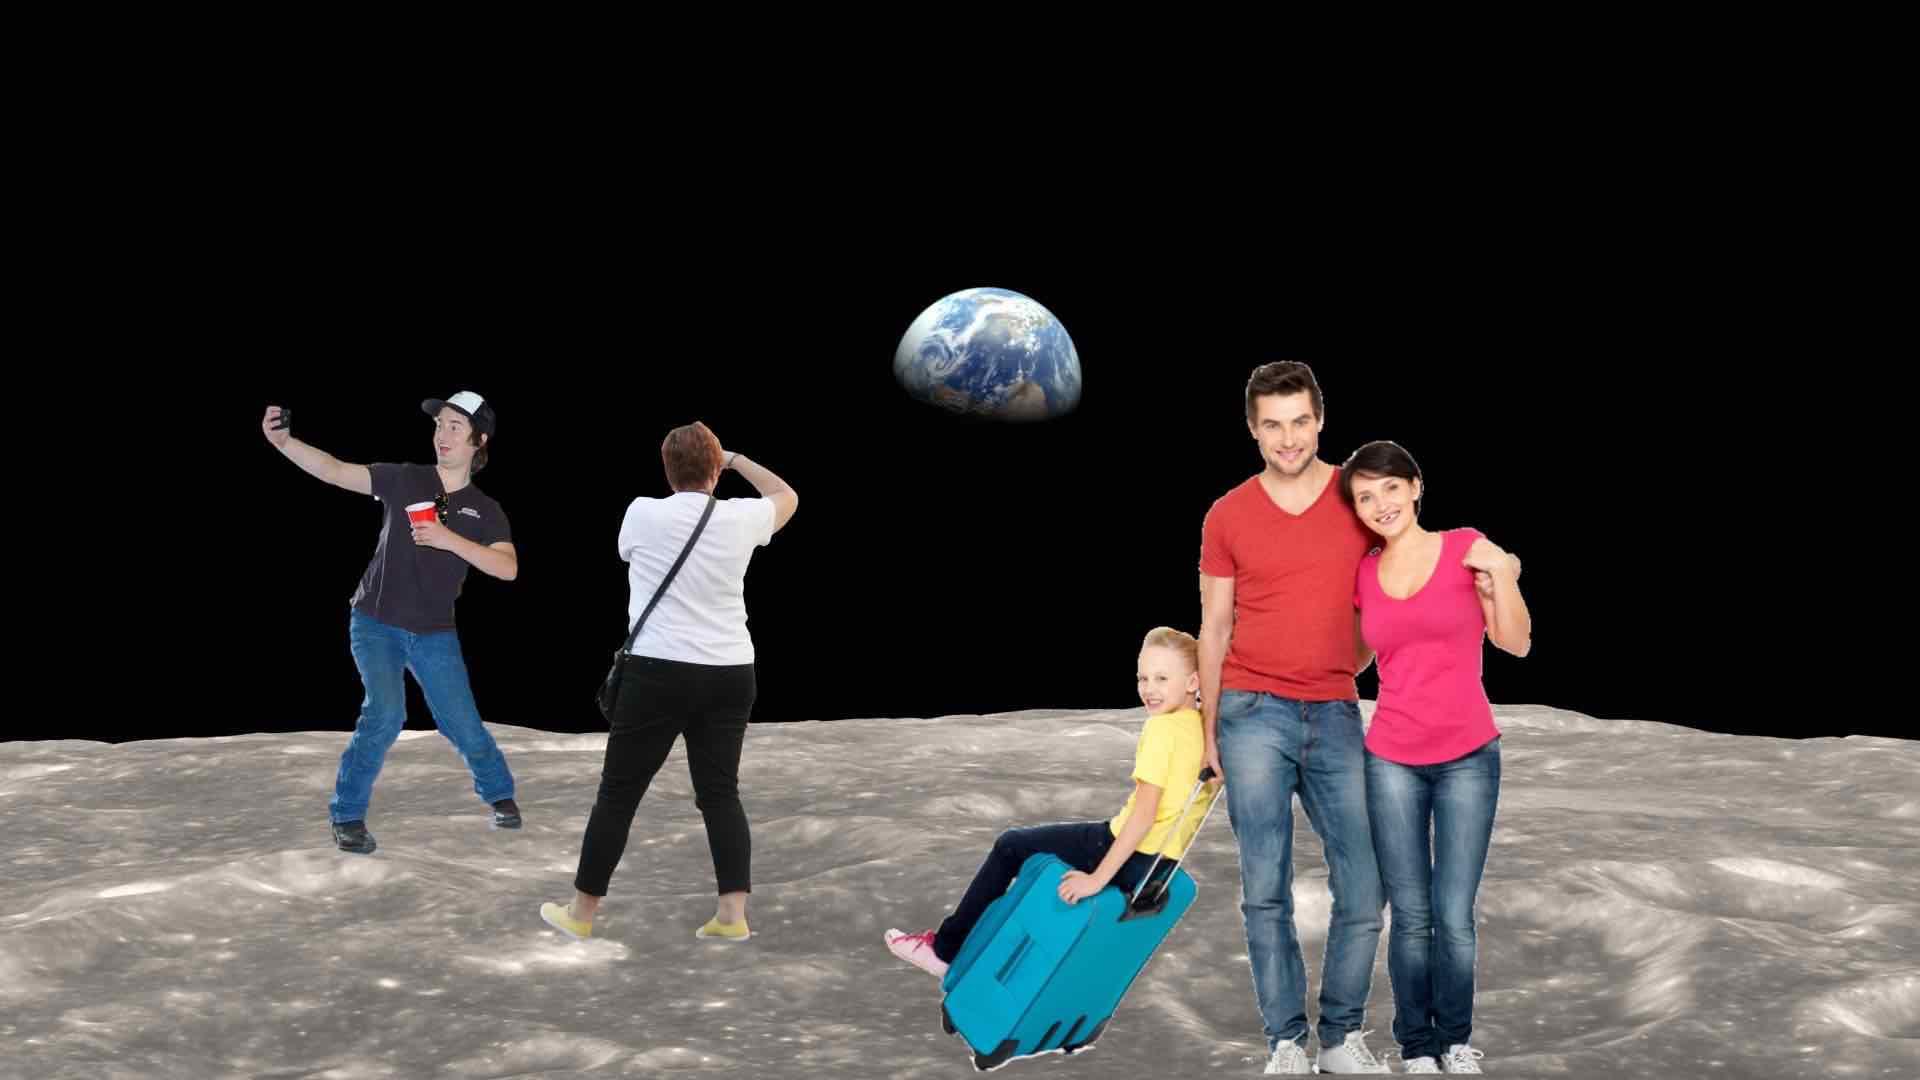 space travel before you die guy